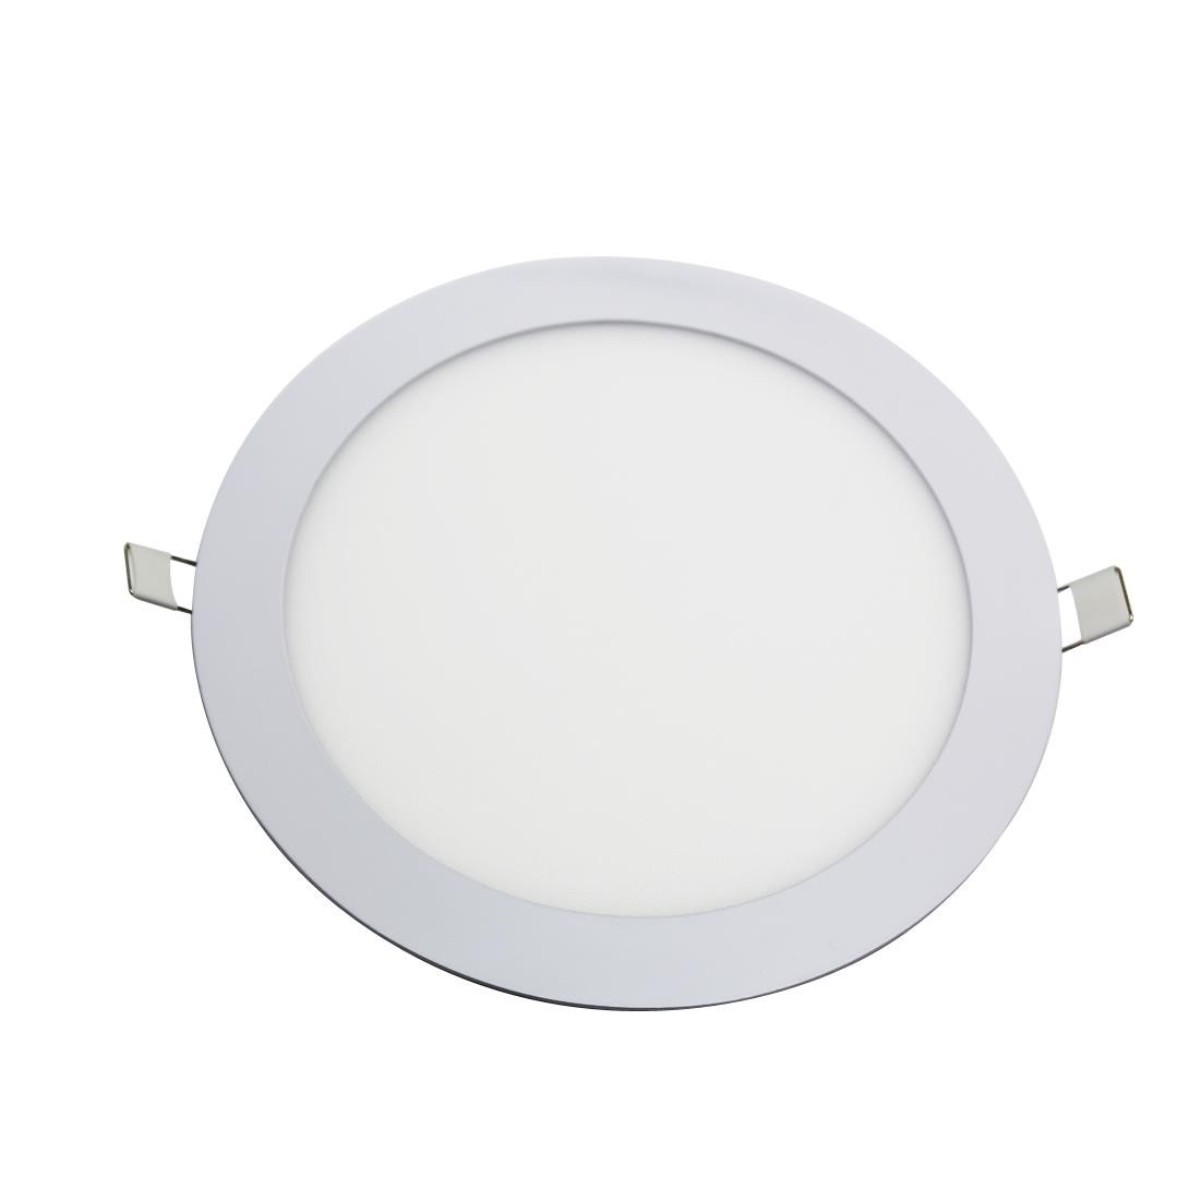 Painel LED de Embutir Redondo 18w 4000k